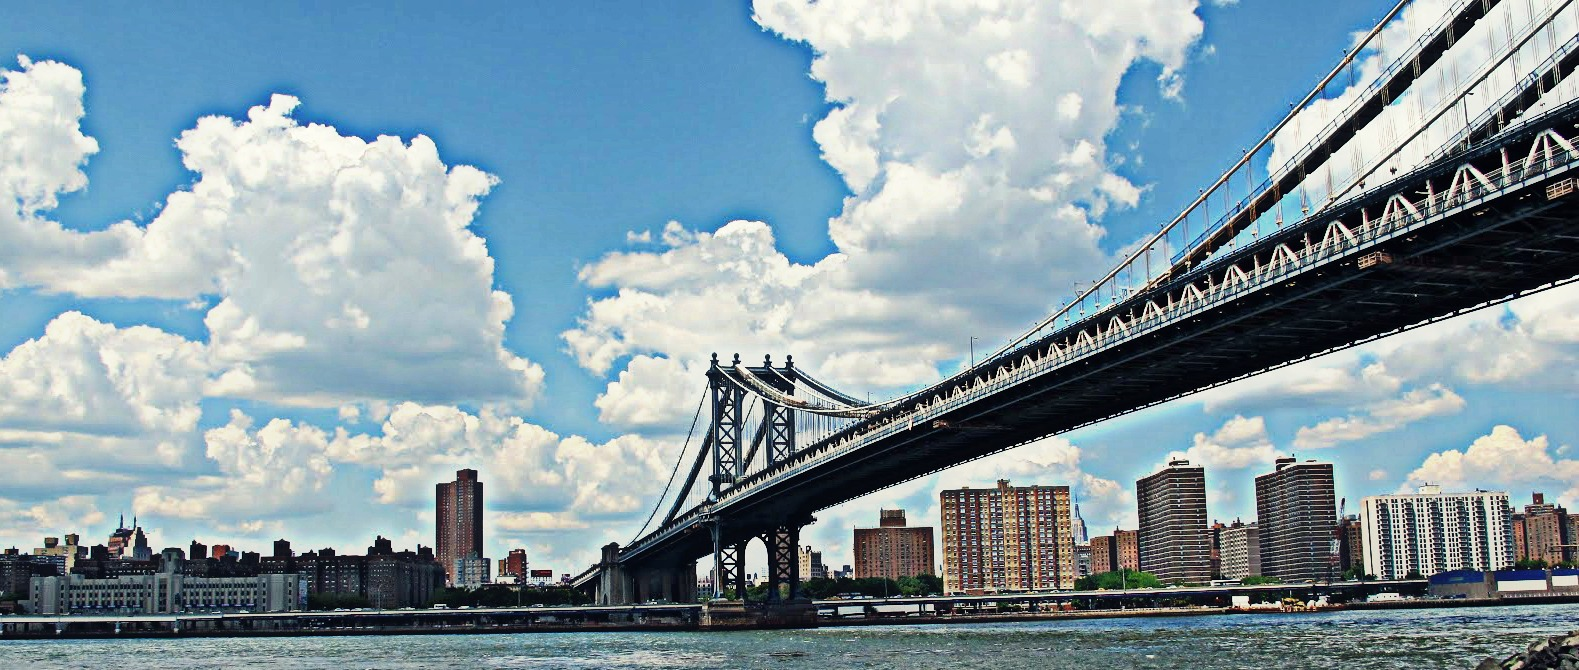 Pratt Institute Brooklyn New York